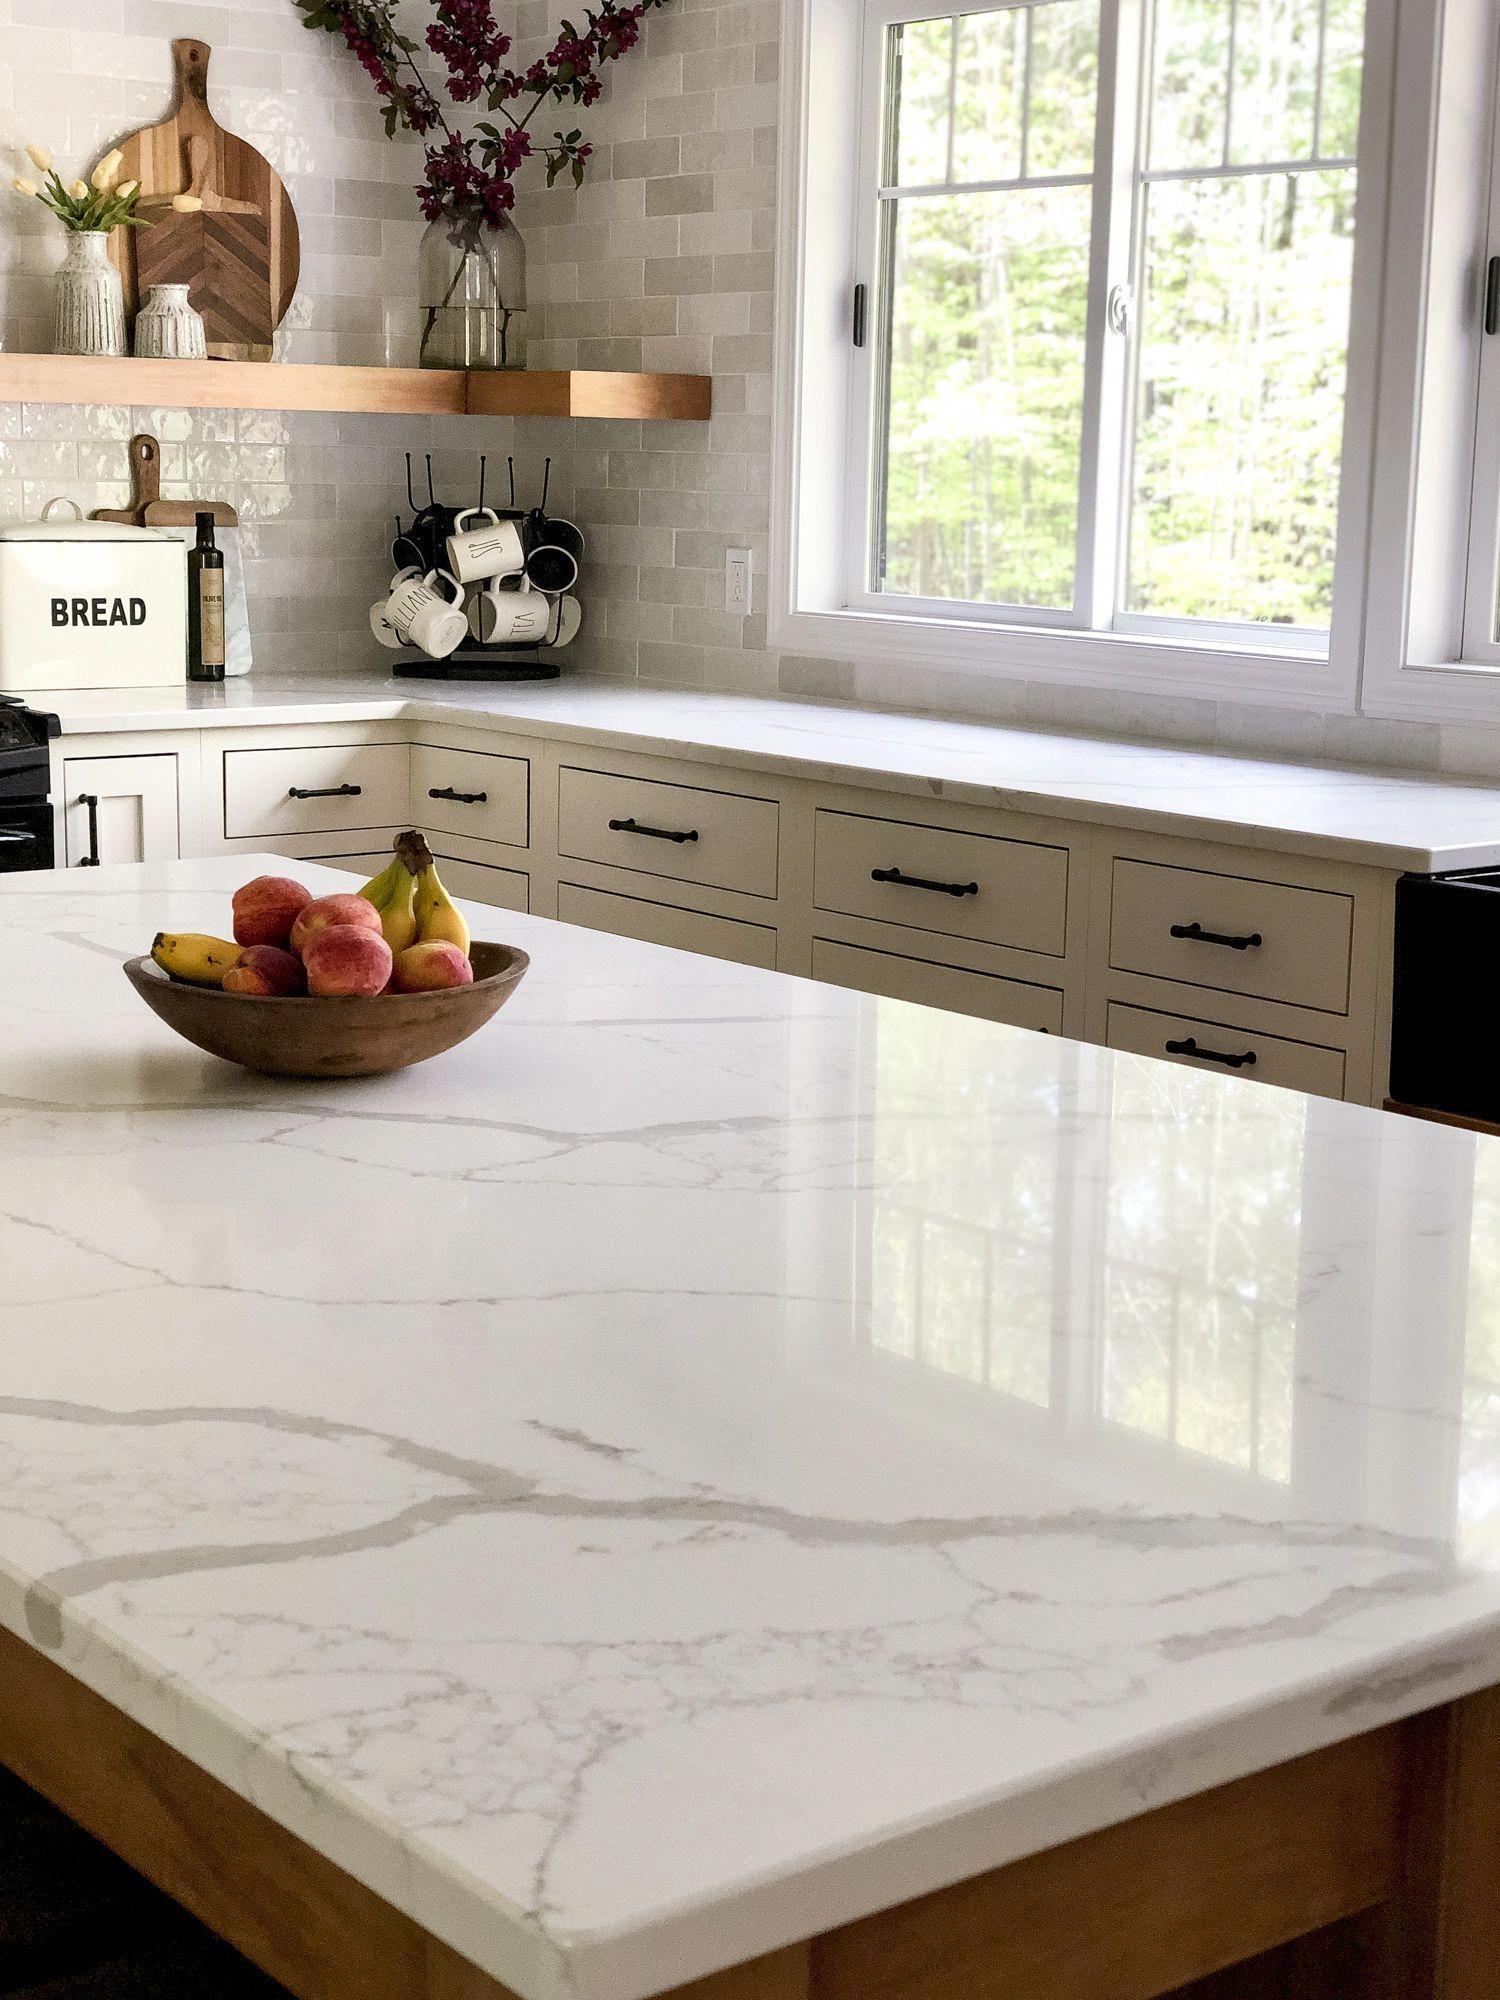 Quartz Countertop That Looks Like Carrara Marble Dreamy Quartz